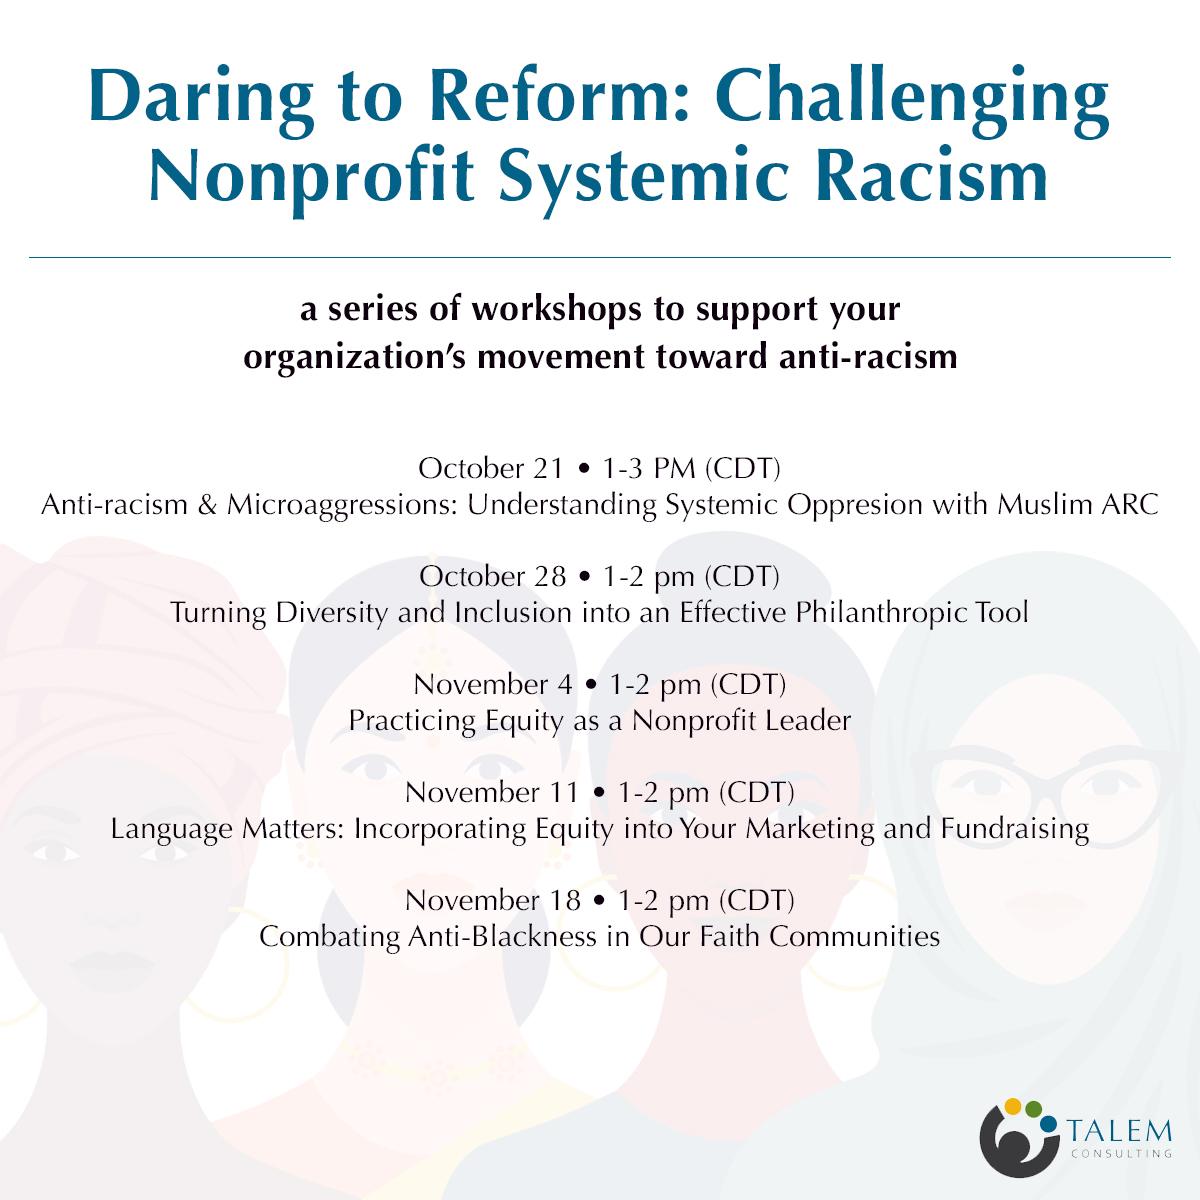 Daring to Reform